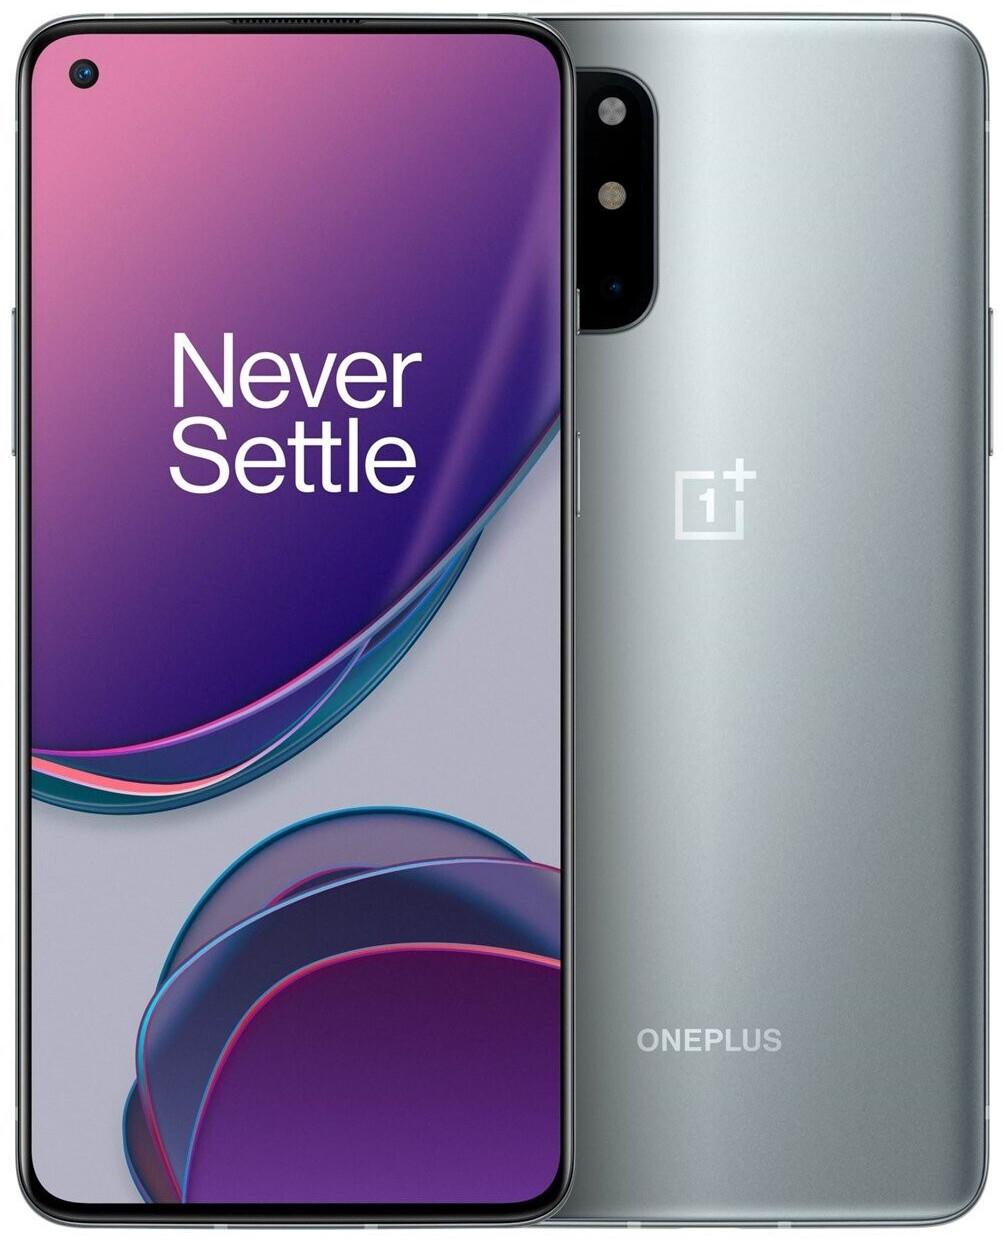 "Smartphone 6.55"" OnePlus 8T - FHD+ 120 Hz, SD 865, 8Go RAM, 128Go, 5G, version CN, argent (+ 26.5€ en Rakuten Points, 514.99€ via RAKUTEN15)"